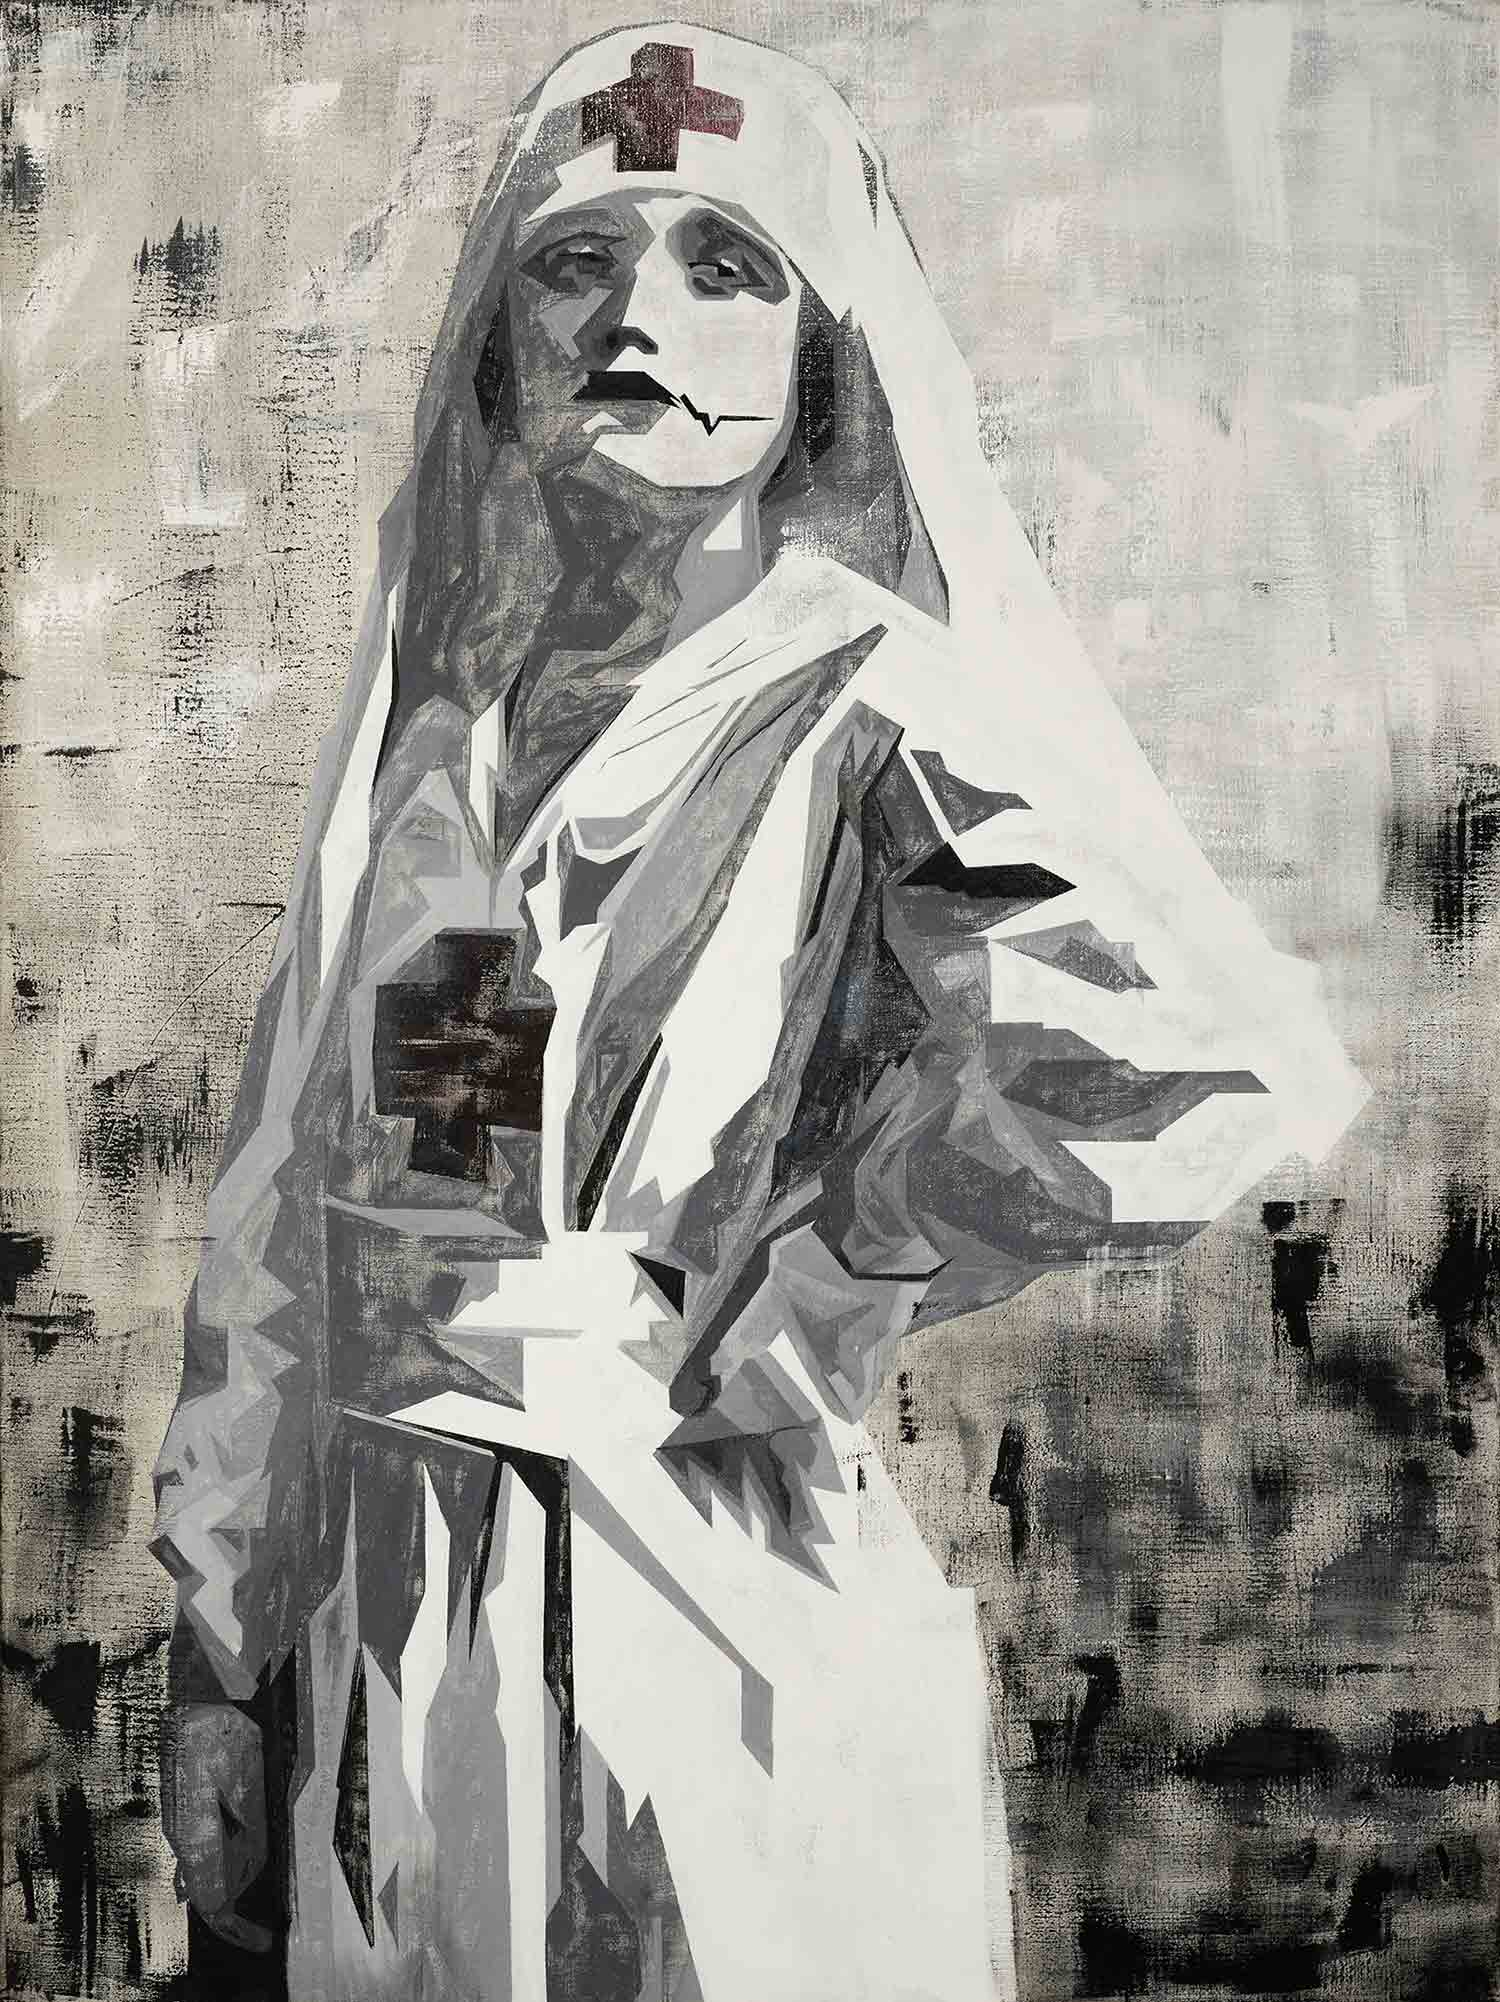 Painting_Nazibraut_DiklaStern_ContemporaryArt